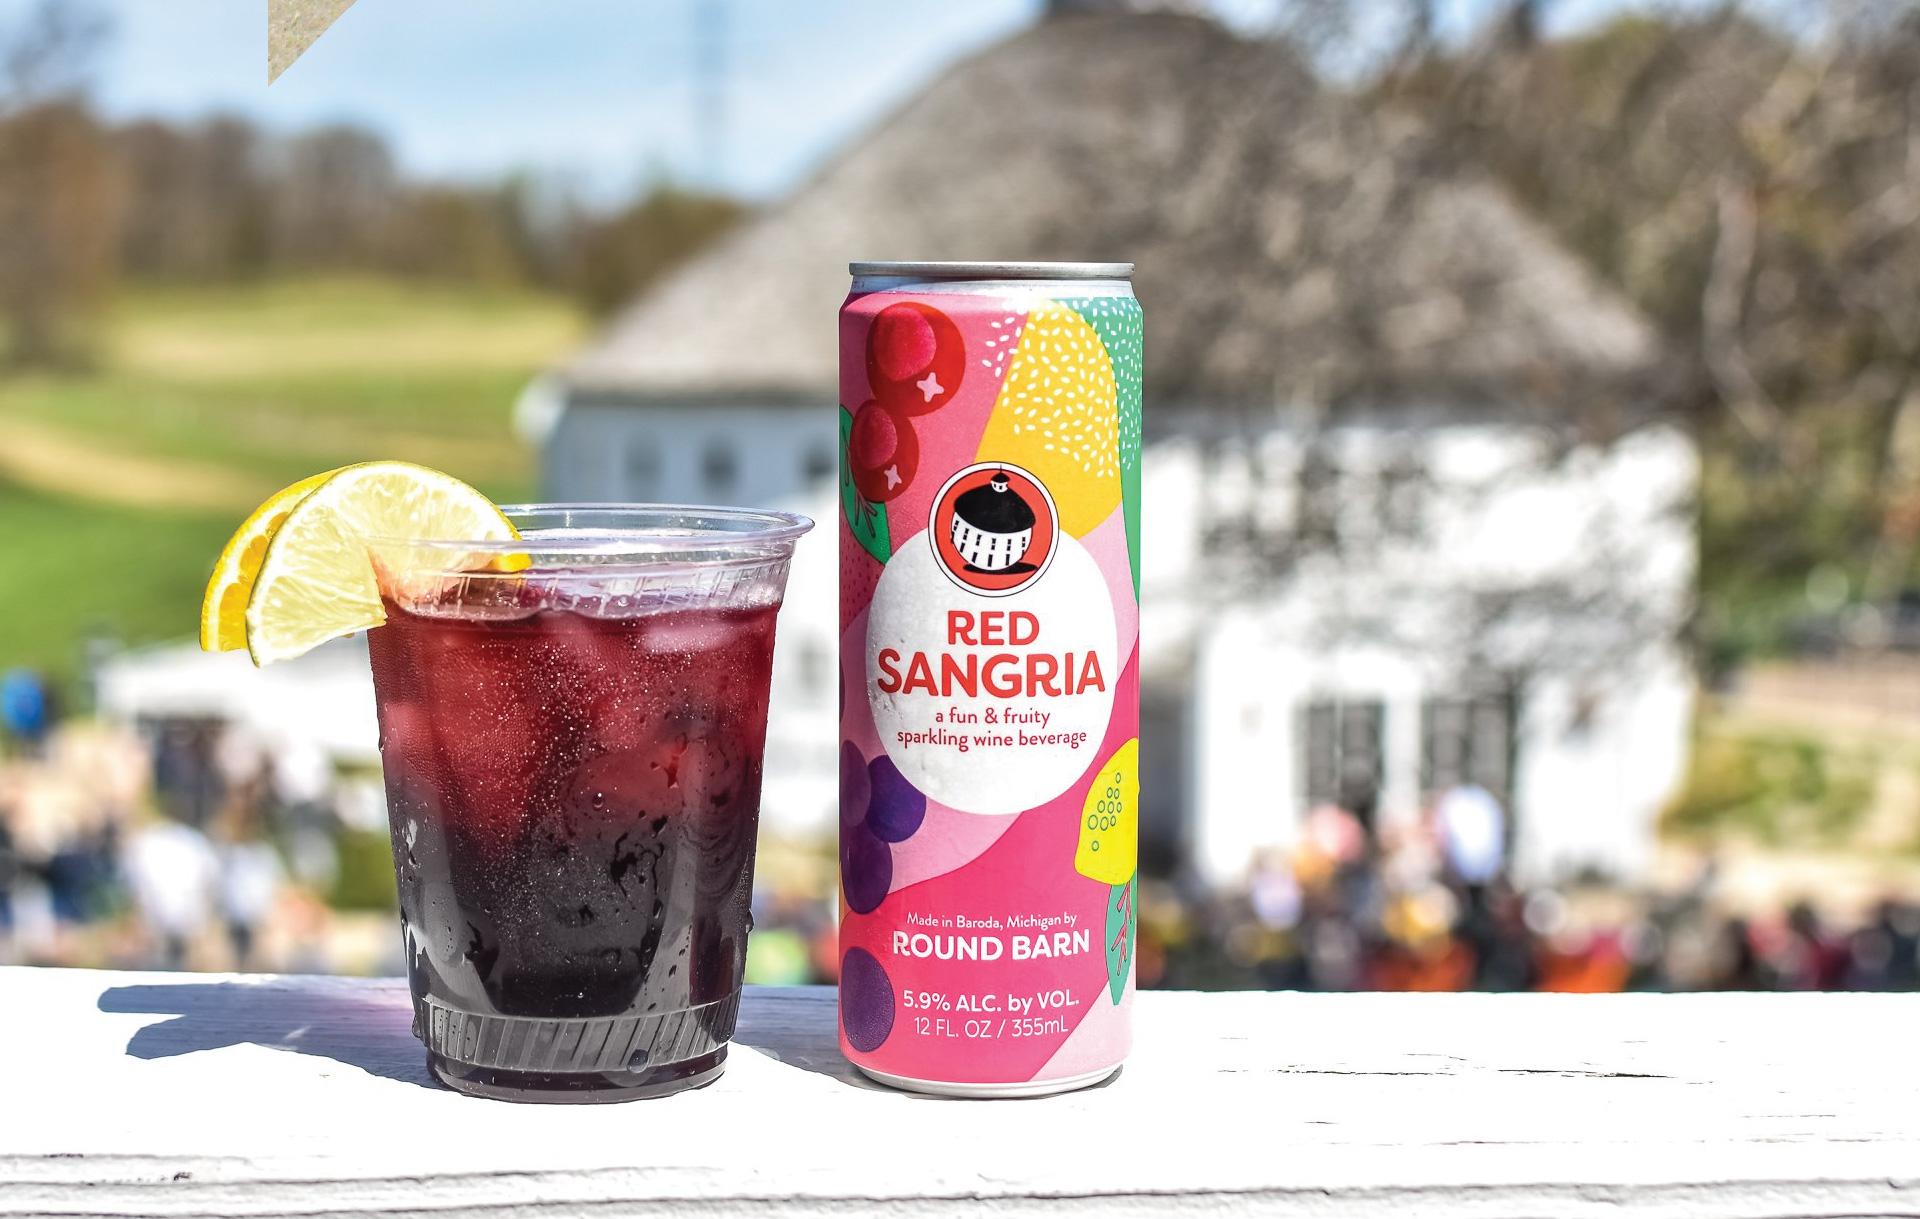 Round Barn Sangria - Brand Launch